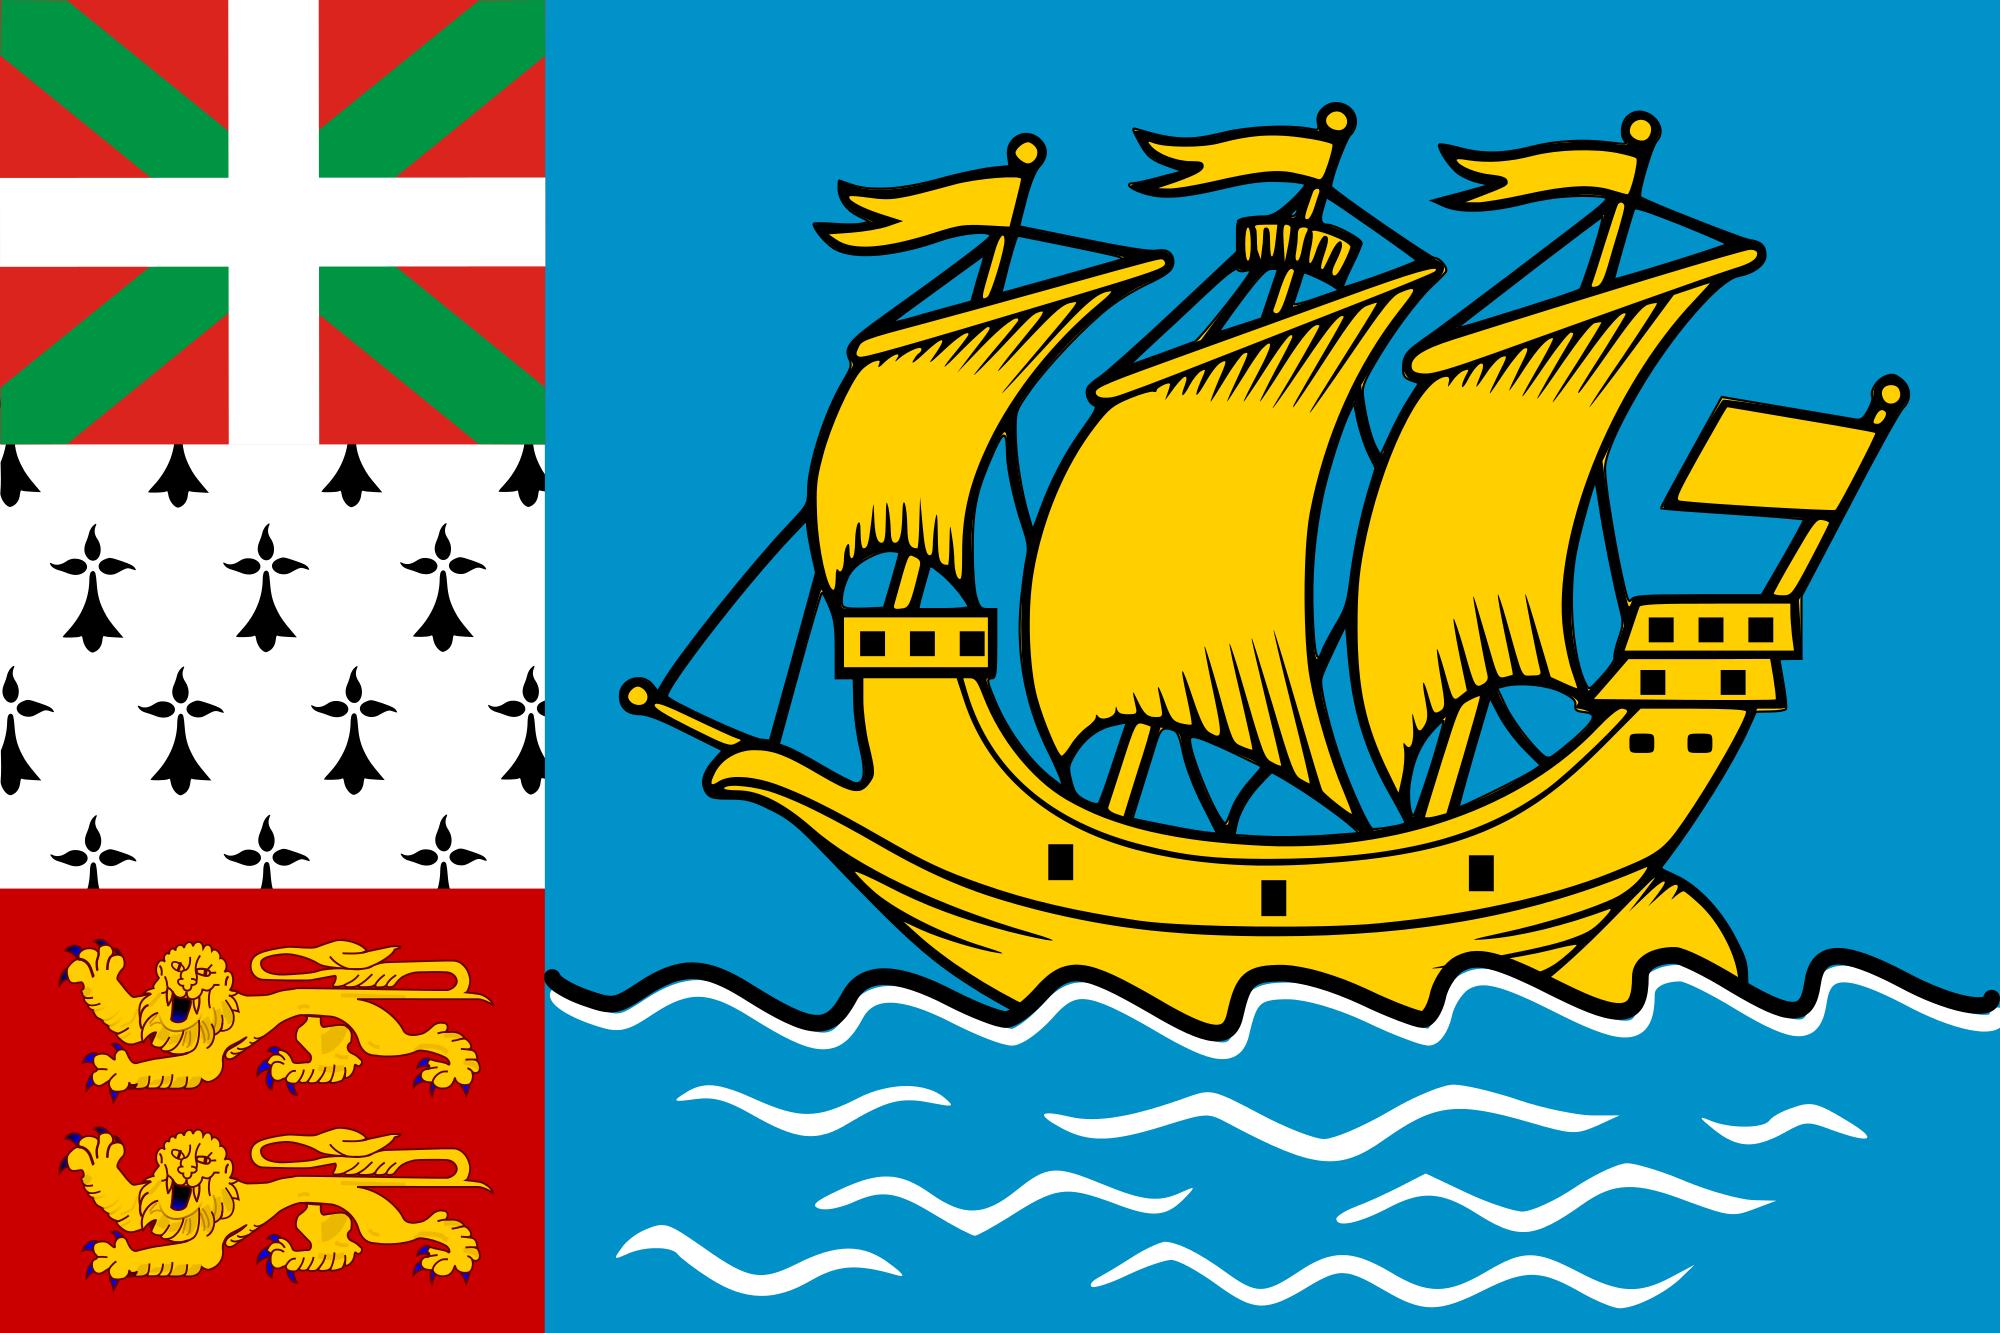 san pedro y miquelón, país, emblema, insignia, σύμβολο - Wallpapers HD - Professor-falken.com